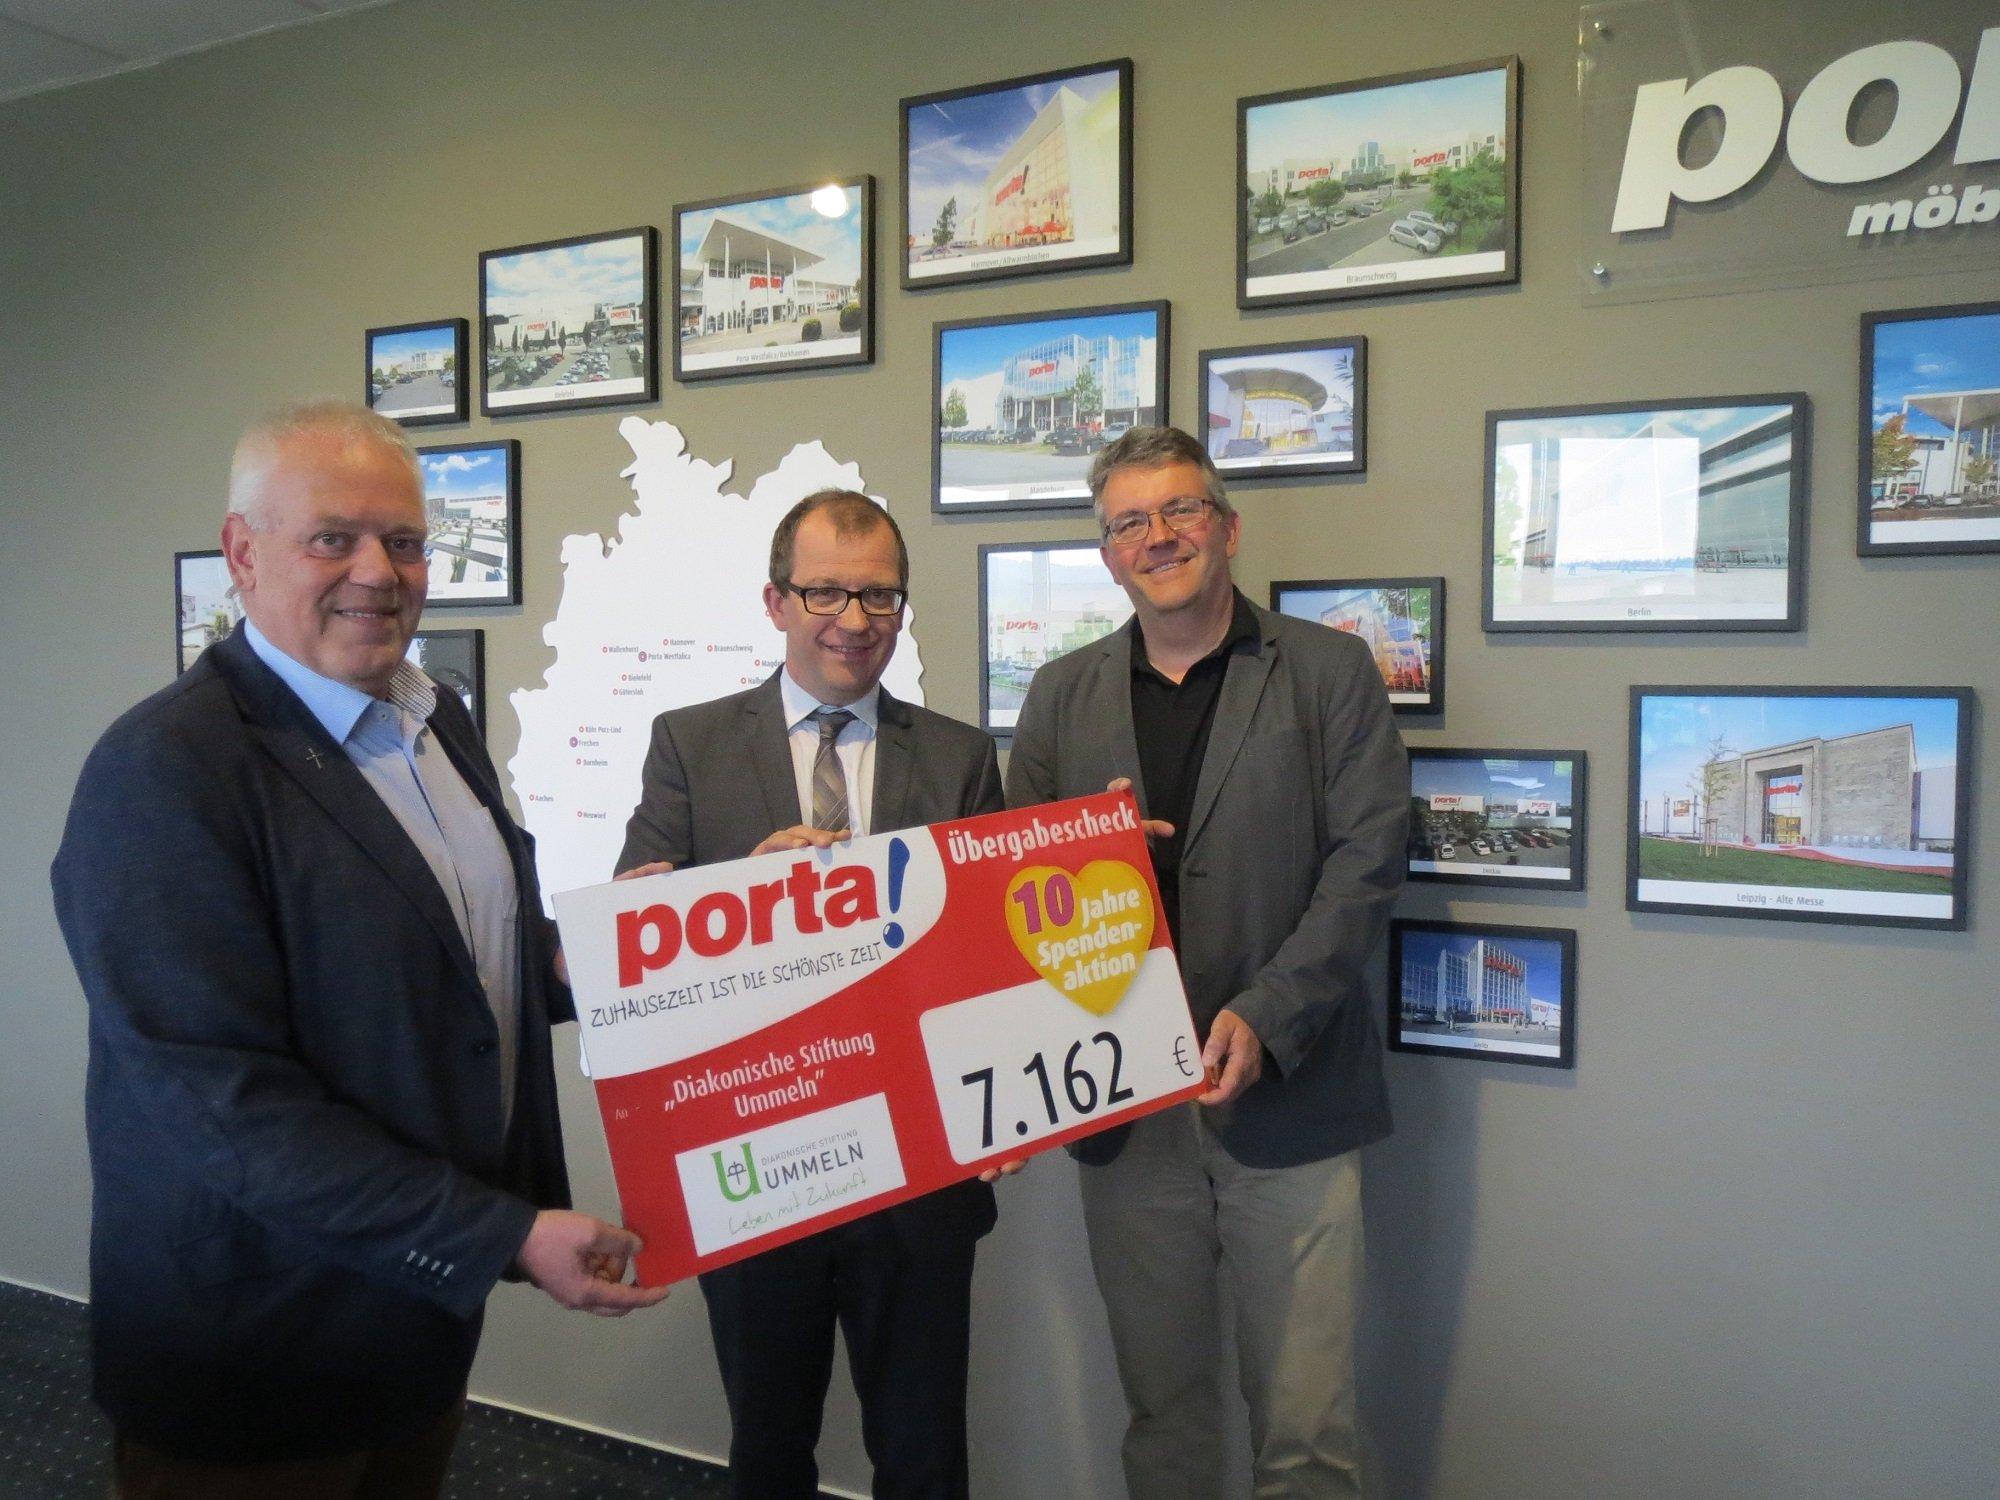 Porta m bel spendet mehr als euro for Porta mobel bielefeld